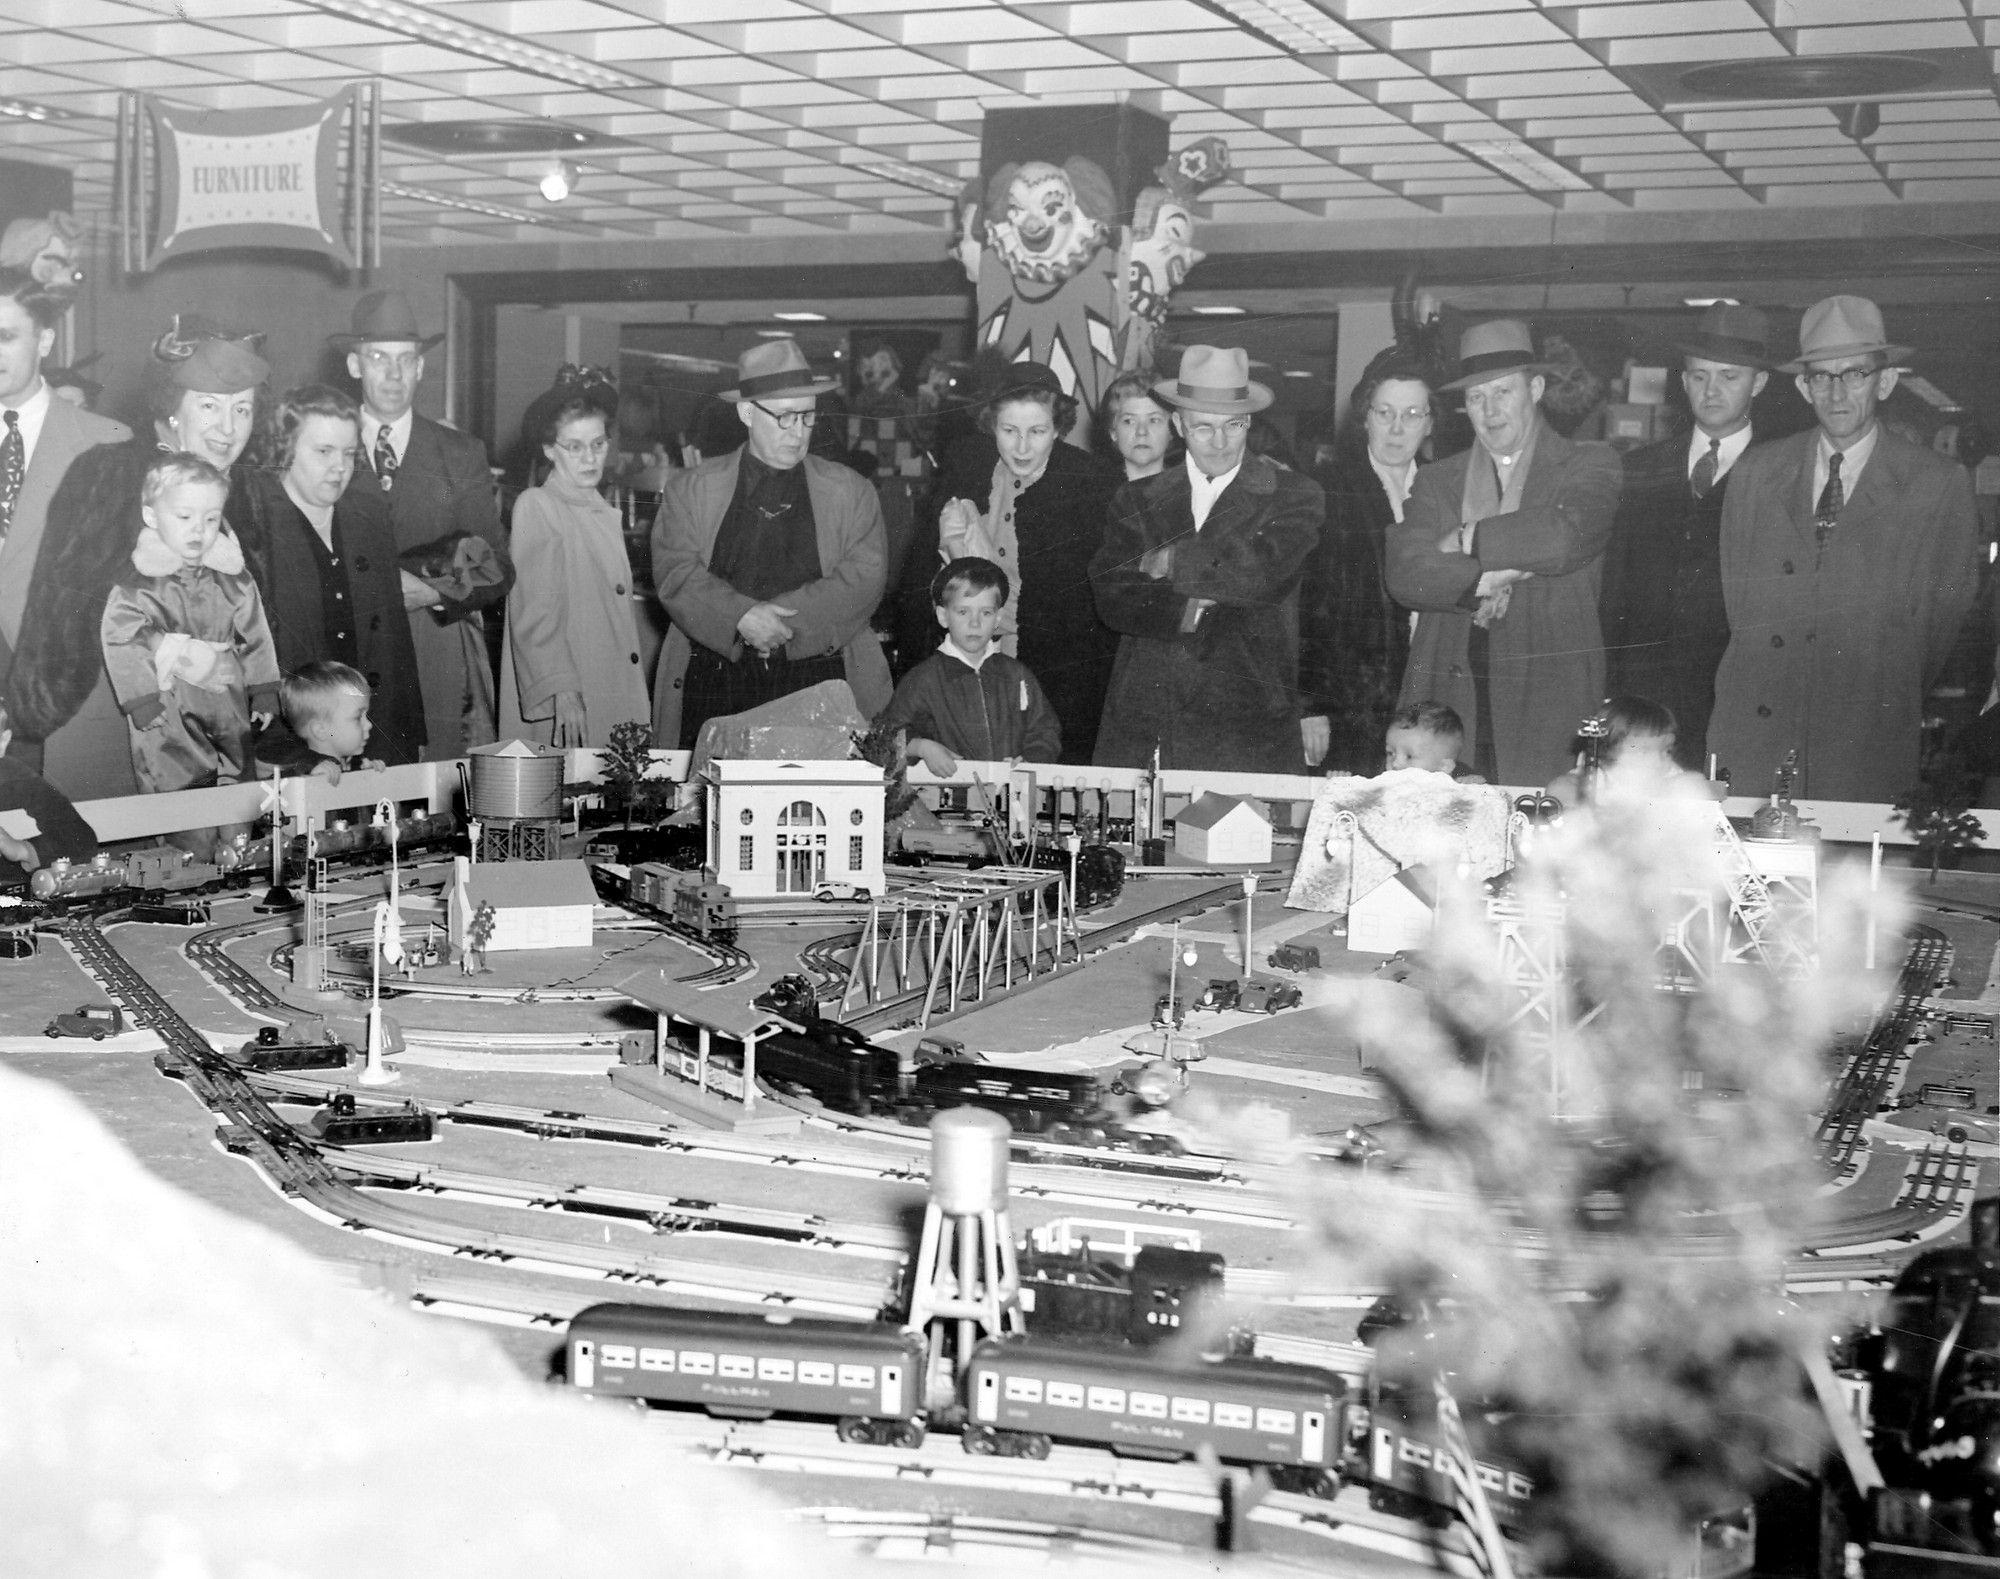 Christmas In Columbus Ohio 2019 Vintage Department Store Toy Train Memories in 2019 | Lazarus